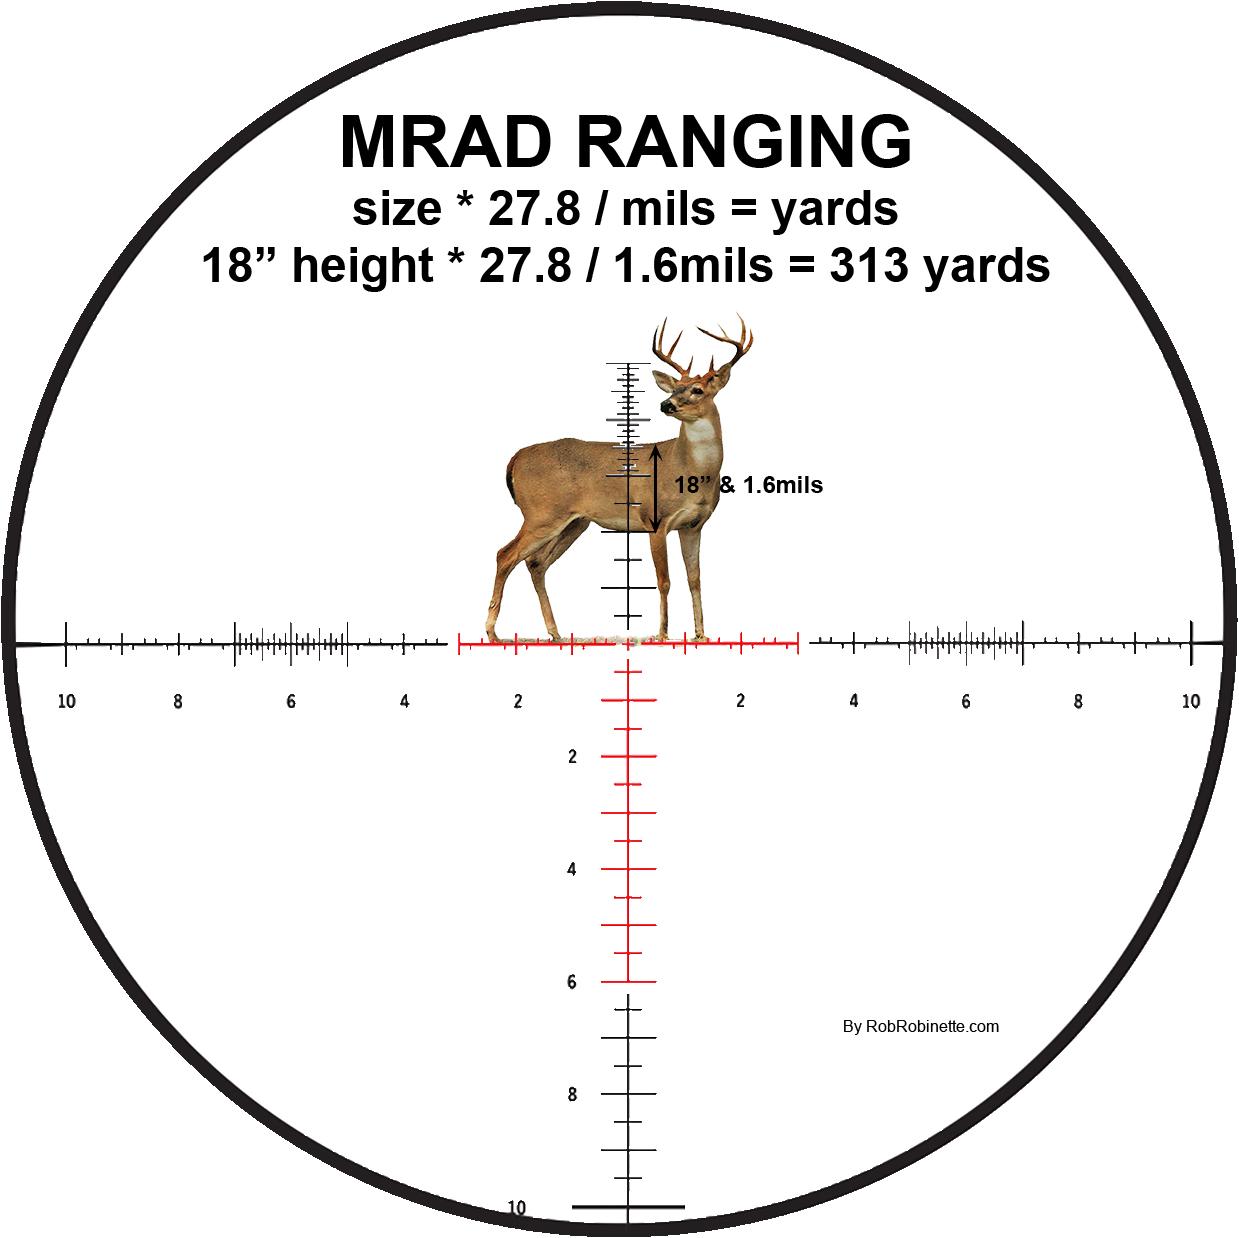 Long Range Mrad Shooting